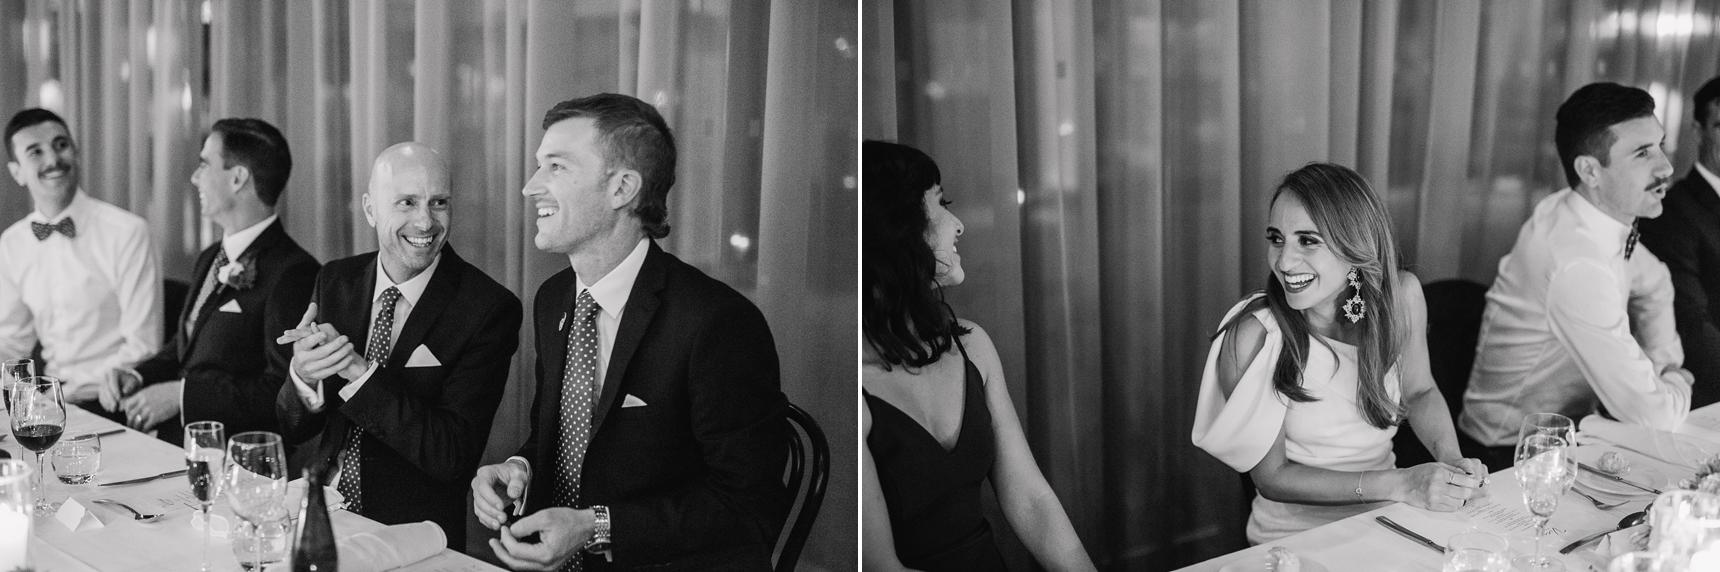 GregLana_ViewBySydney_WeddingPhotography084.jpg